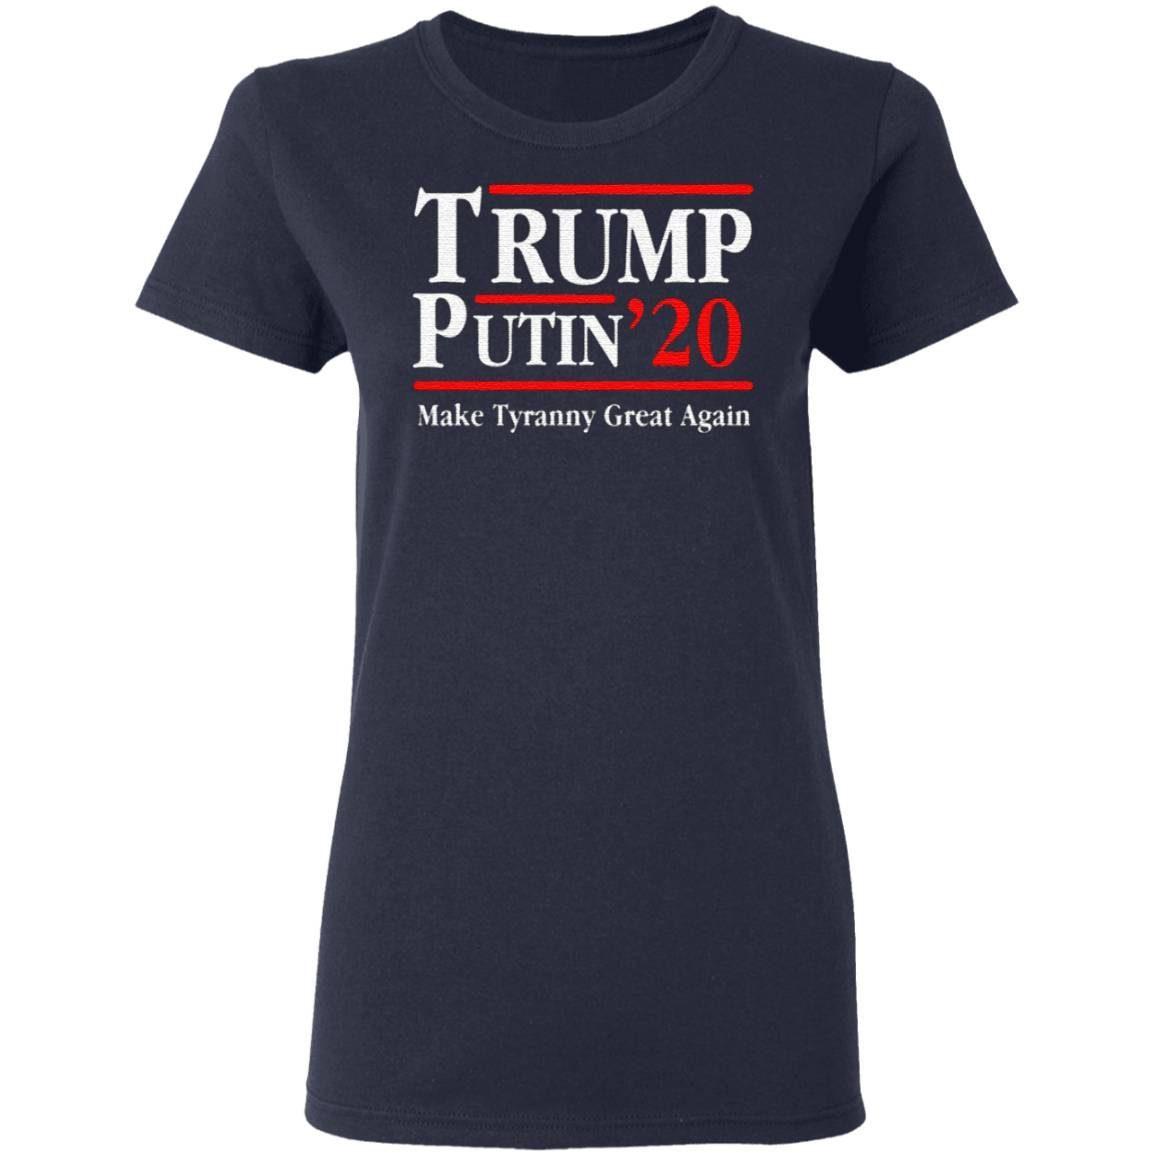 Trump Putin 2020 T Shirt